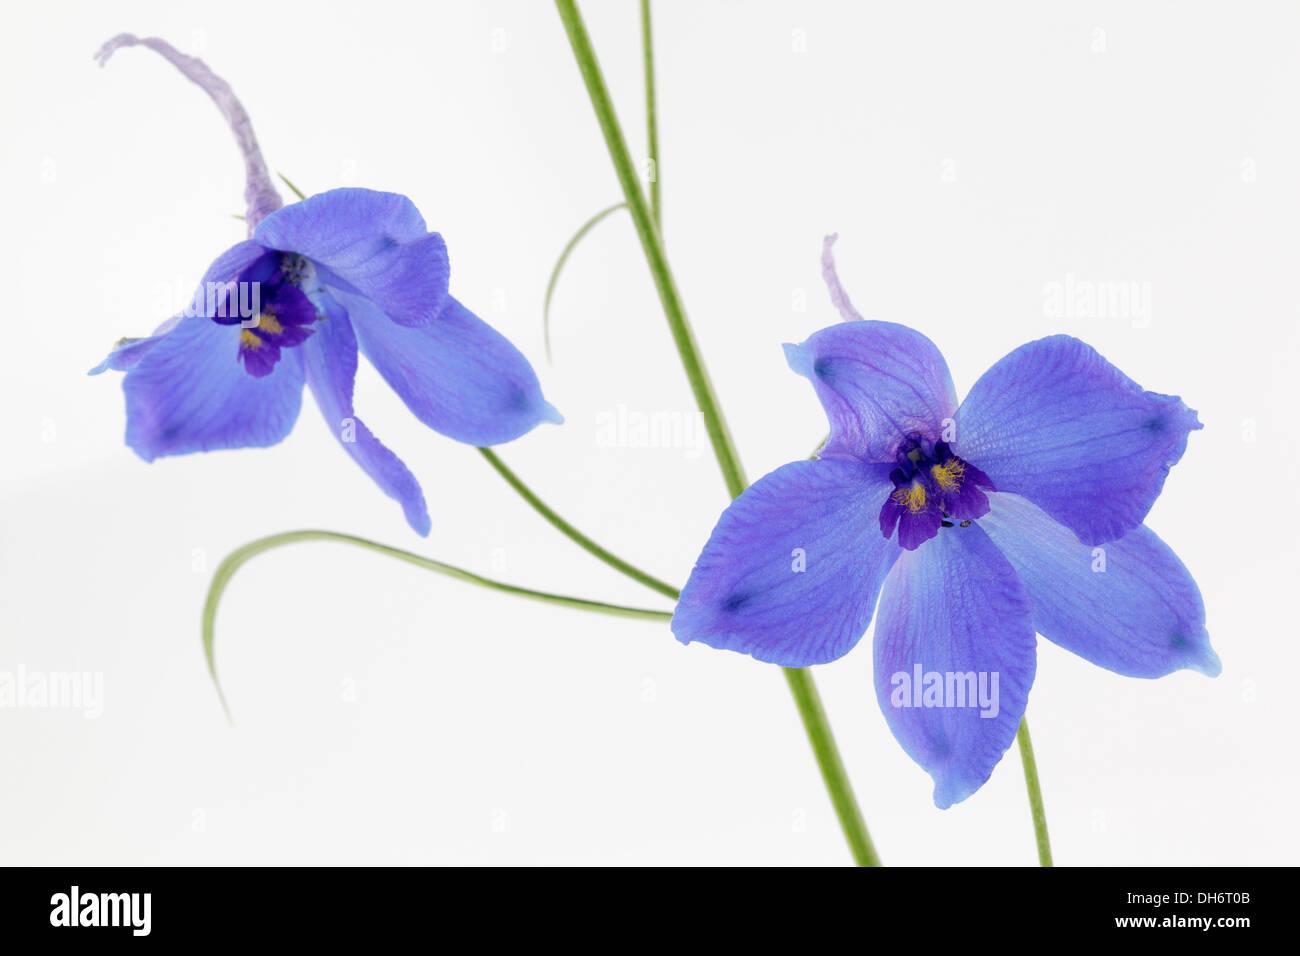 Blue Delphiniums on white background - Stock Image